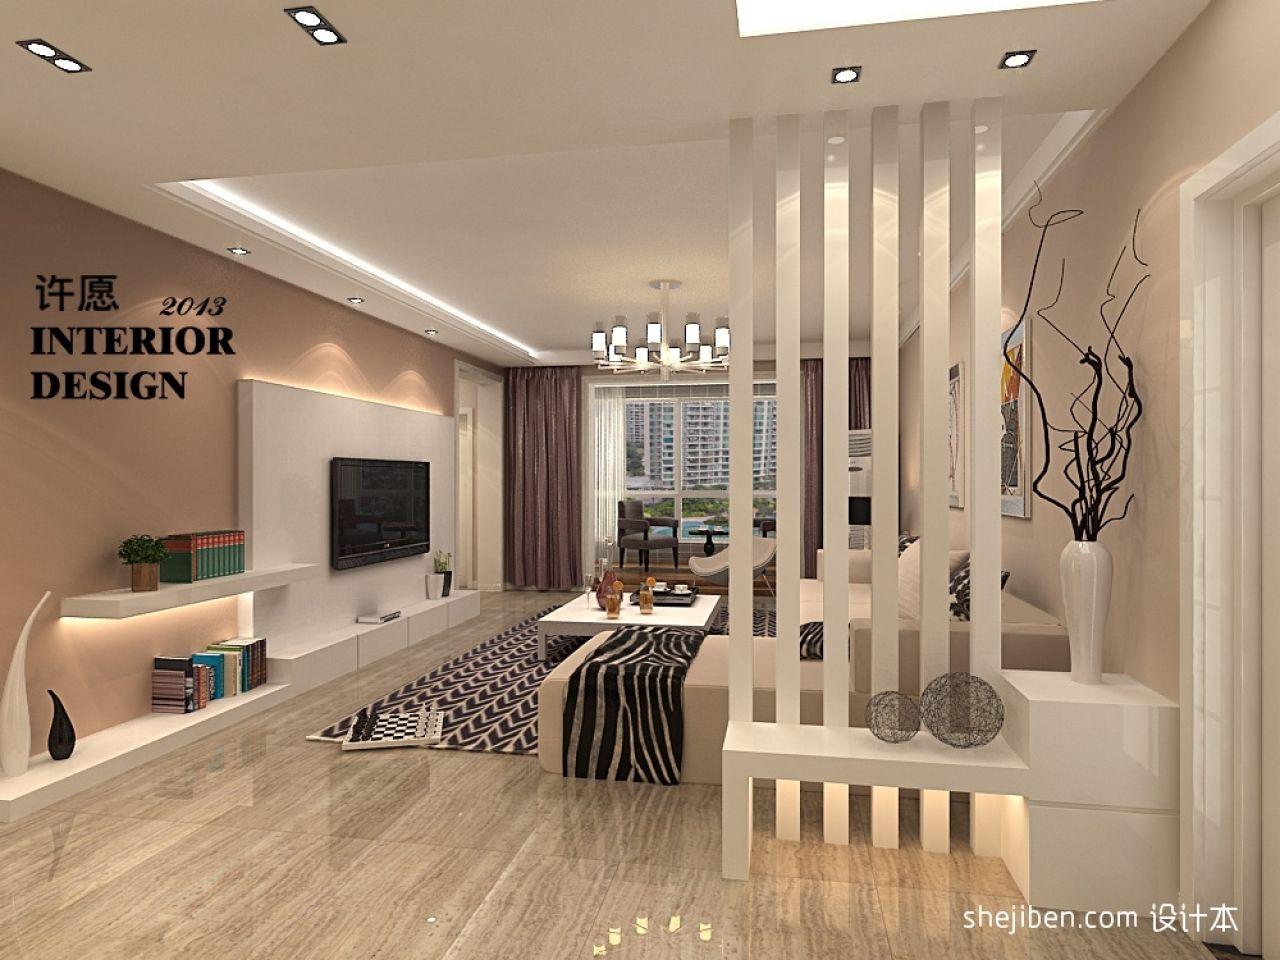 Modern Room Divider Living Room Divider Living Room Partition Domestic room divider walls